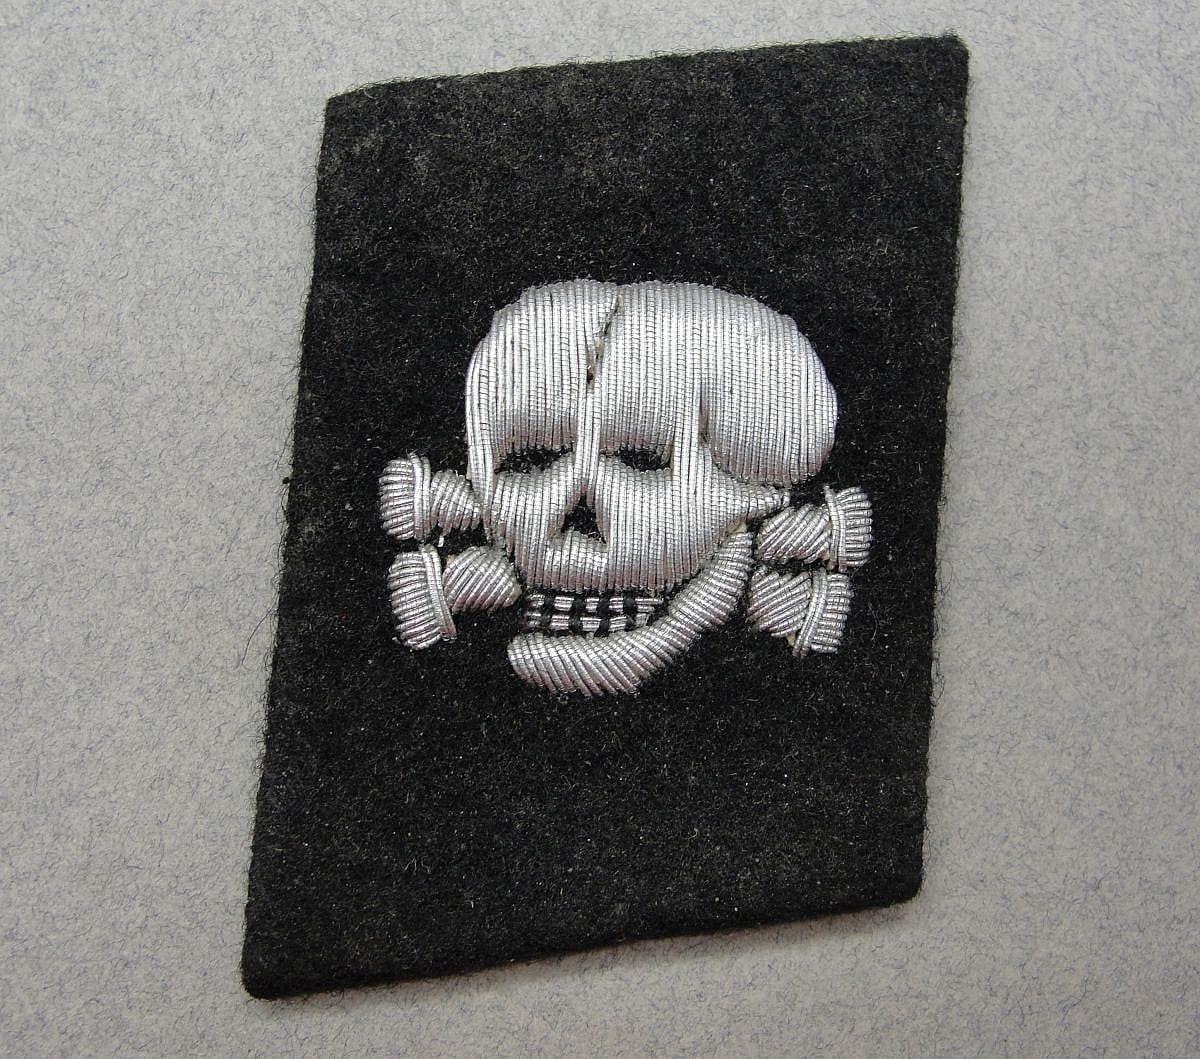 SS Totenkopfvervände (Death Head Units) Skull Collar Tab with SS/RZM Tag